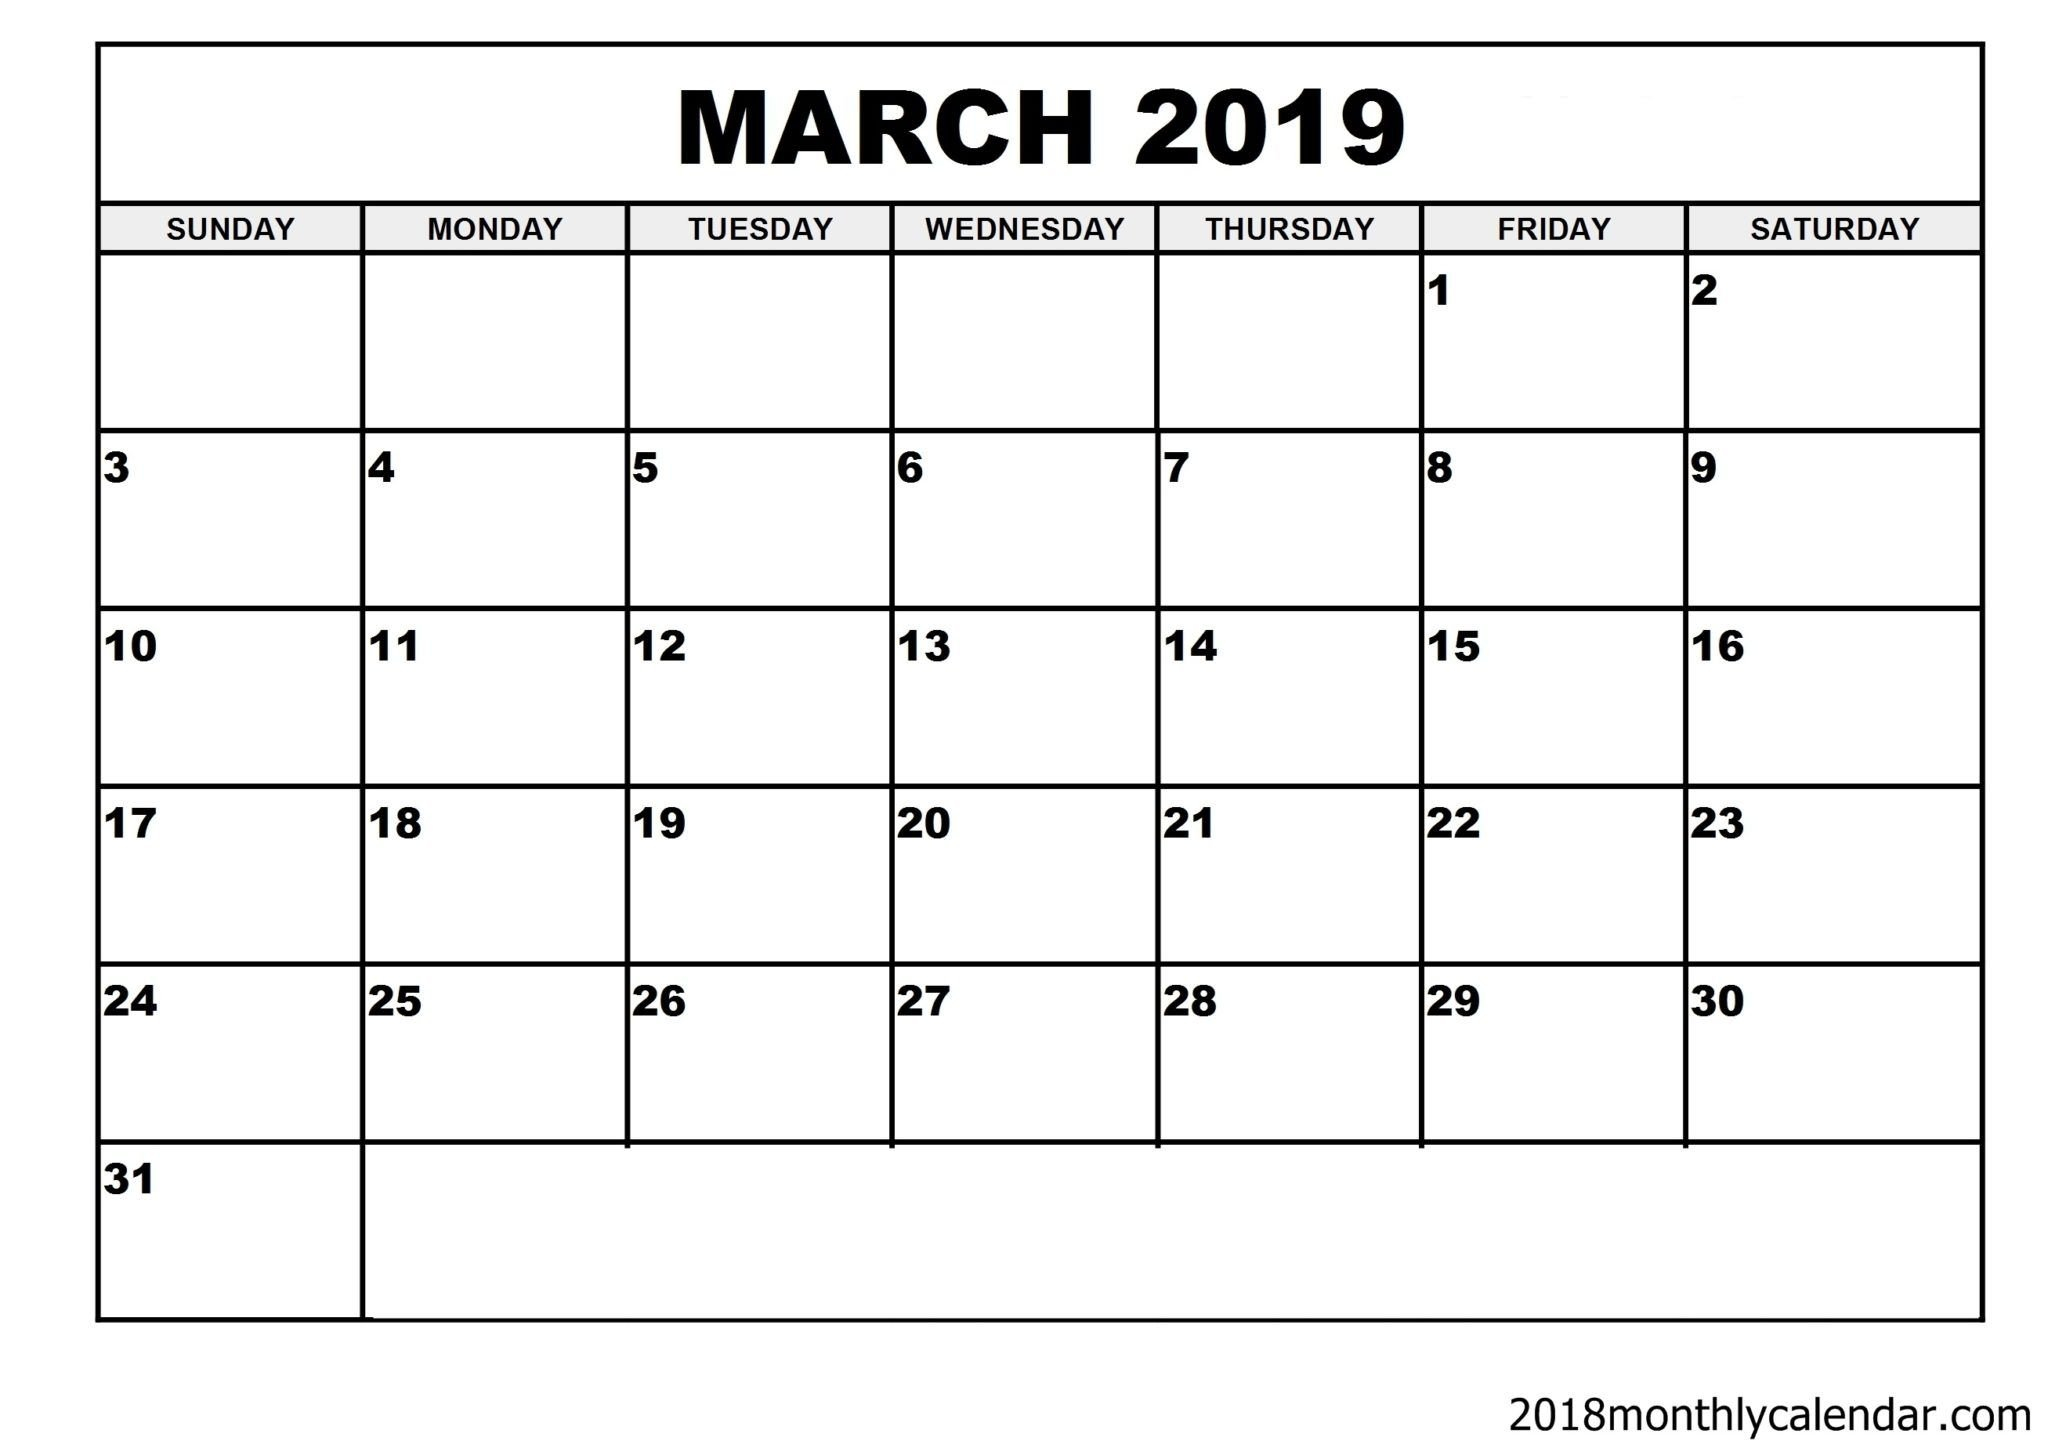 Download March 2019 Calendar – Blank Template - Editable Calendar Calendar 2019 Vertex